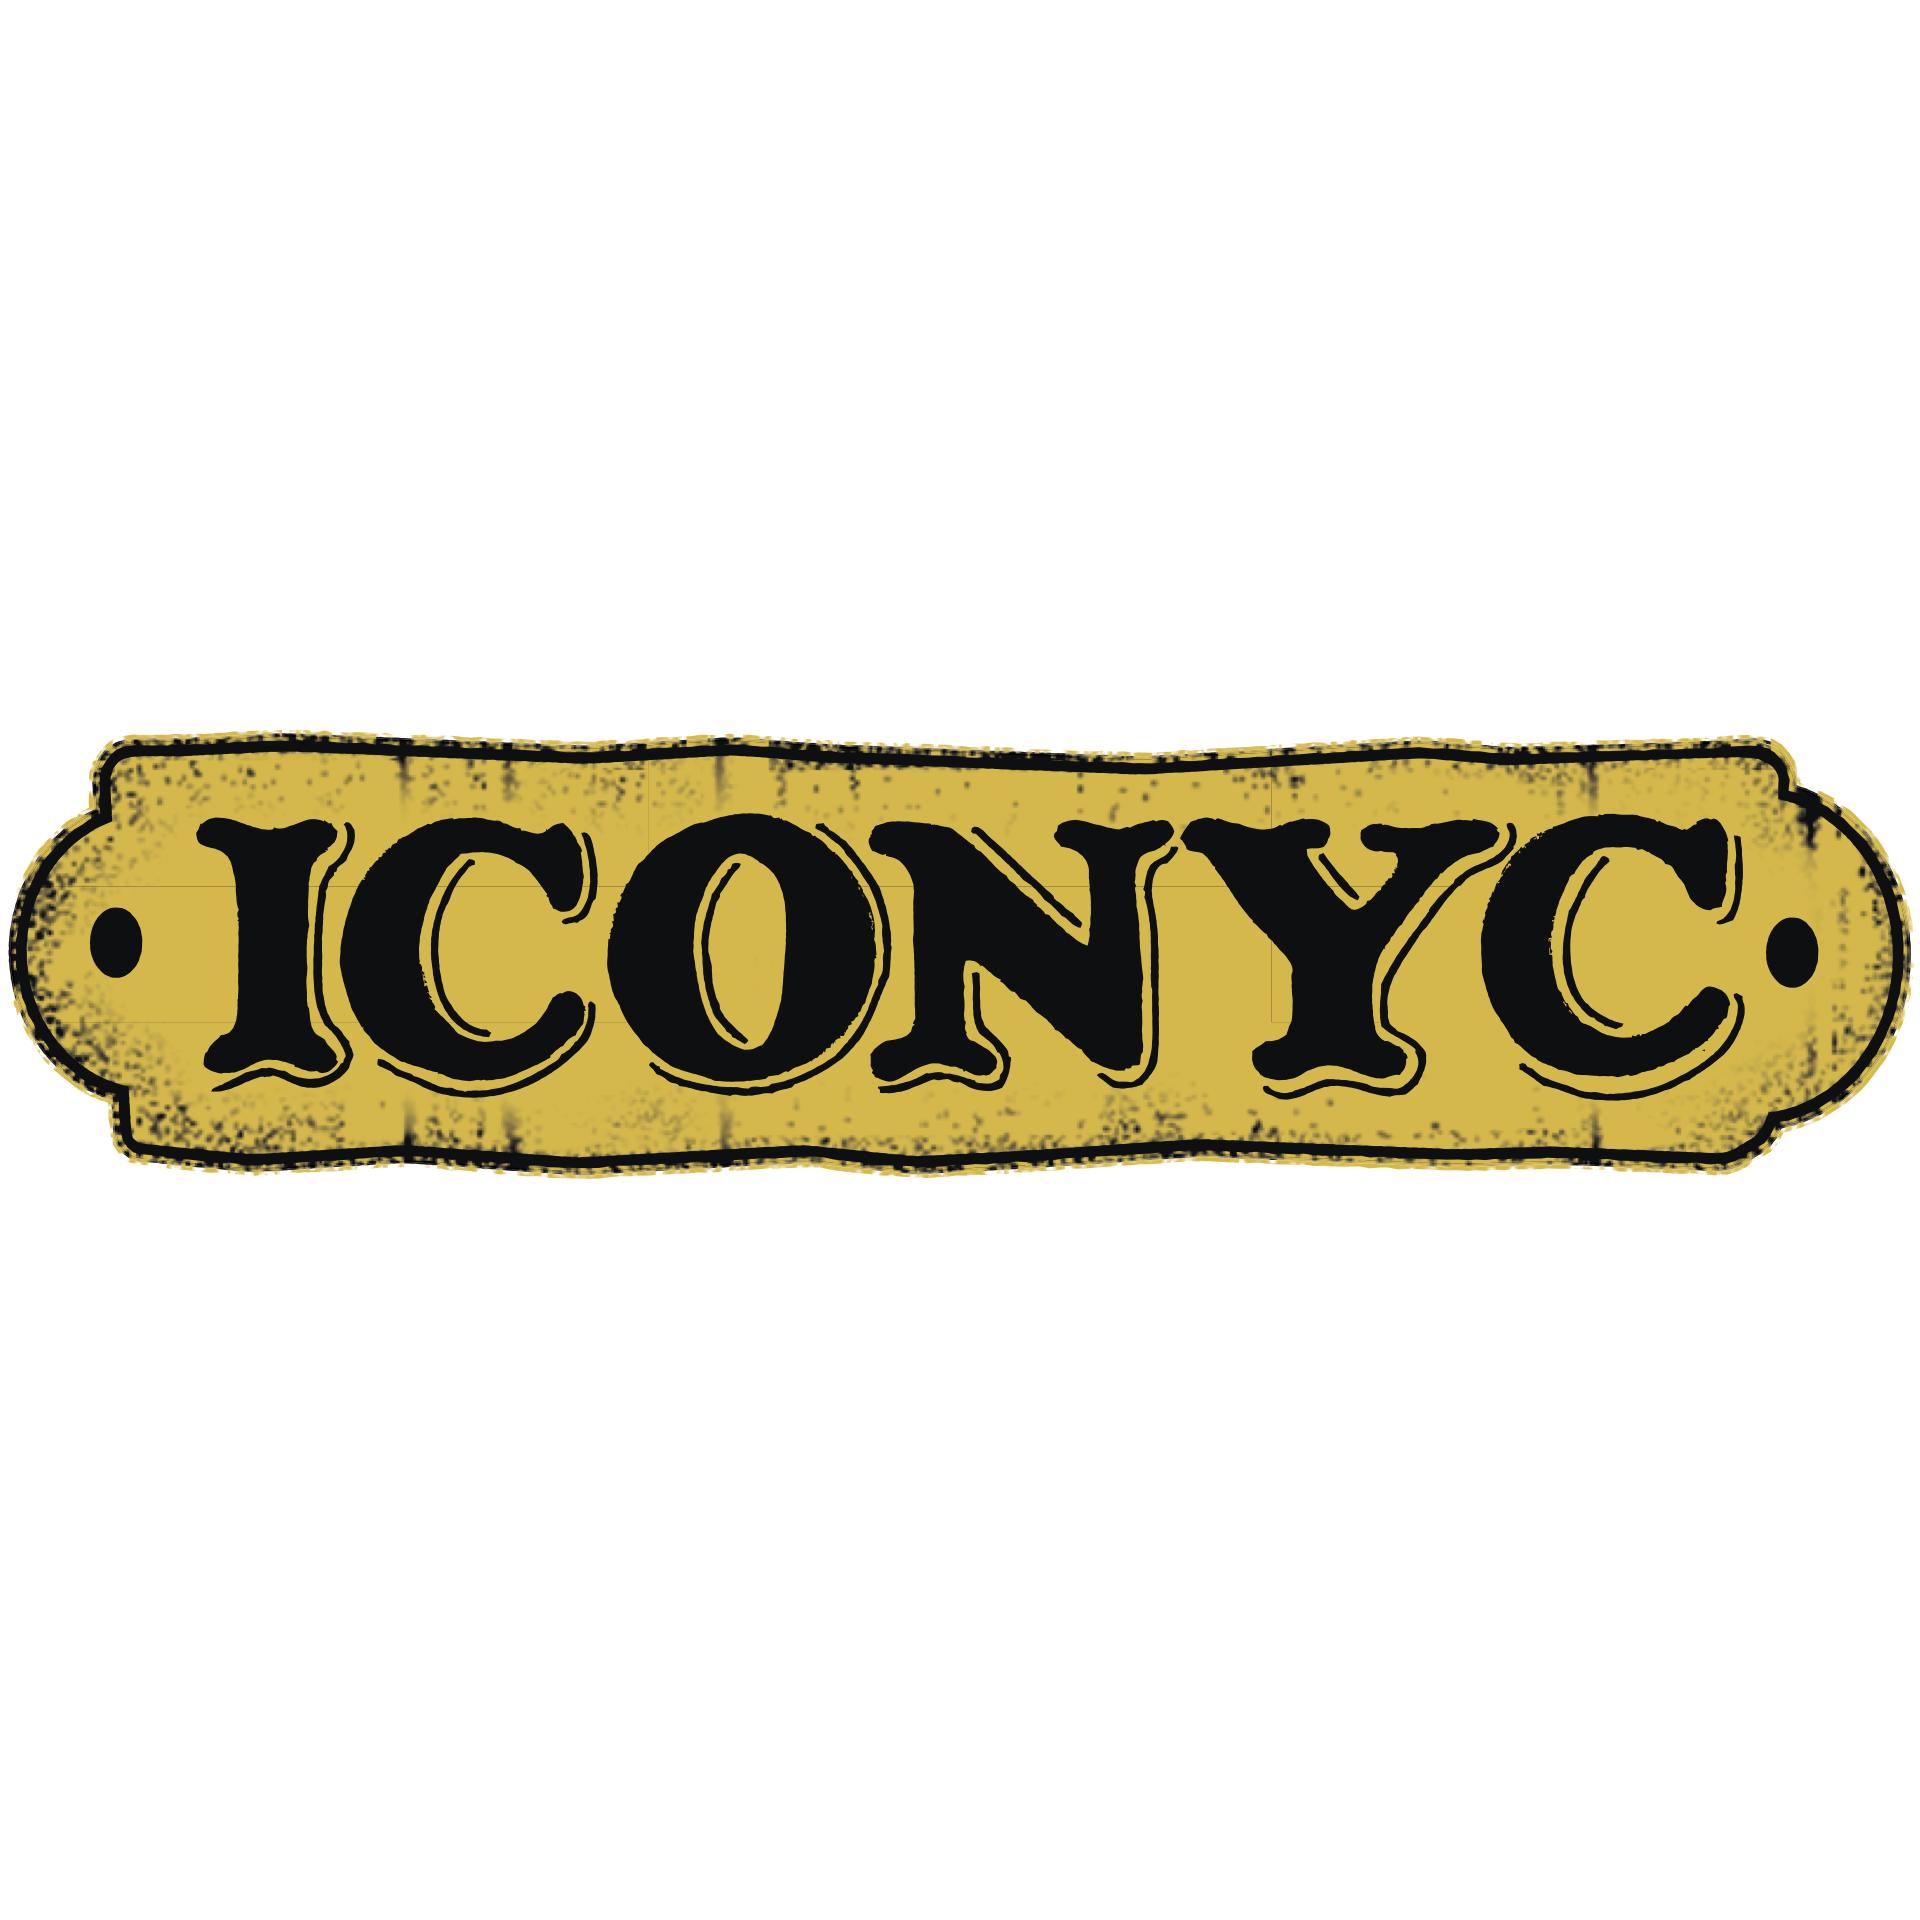 ICONYC Steamline Lager beer Label Full Size